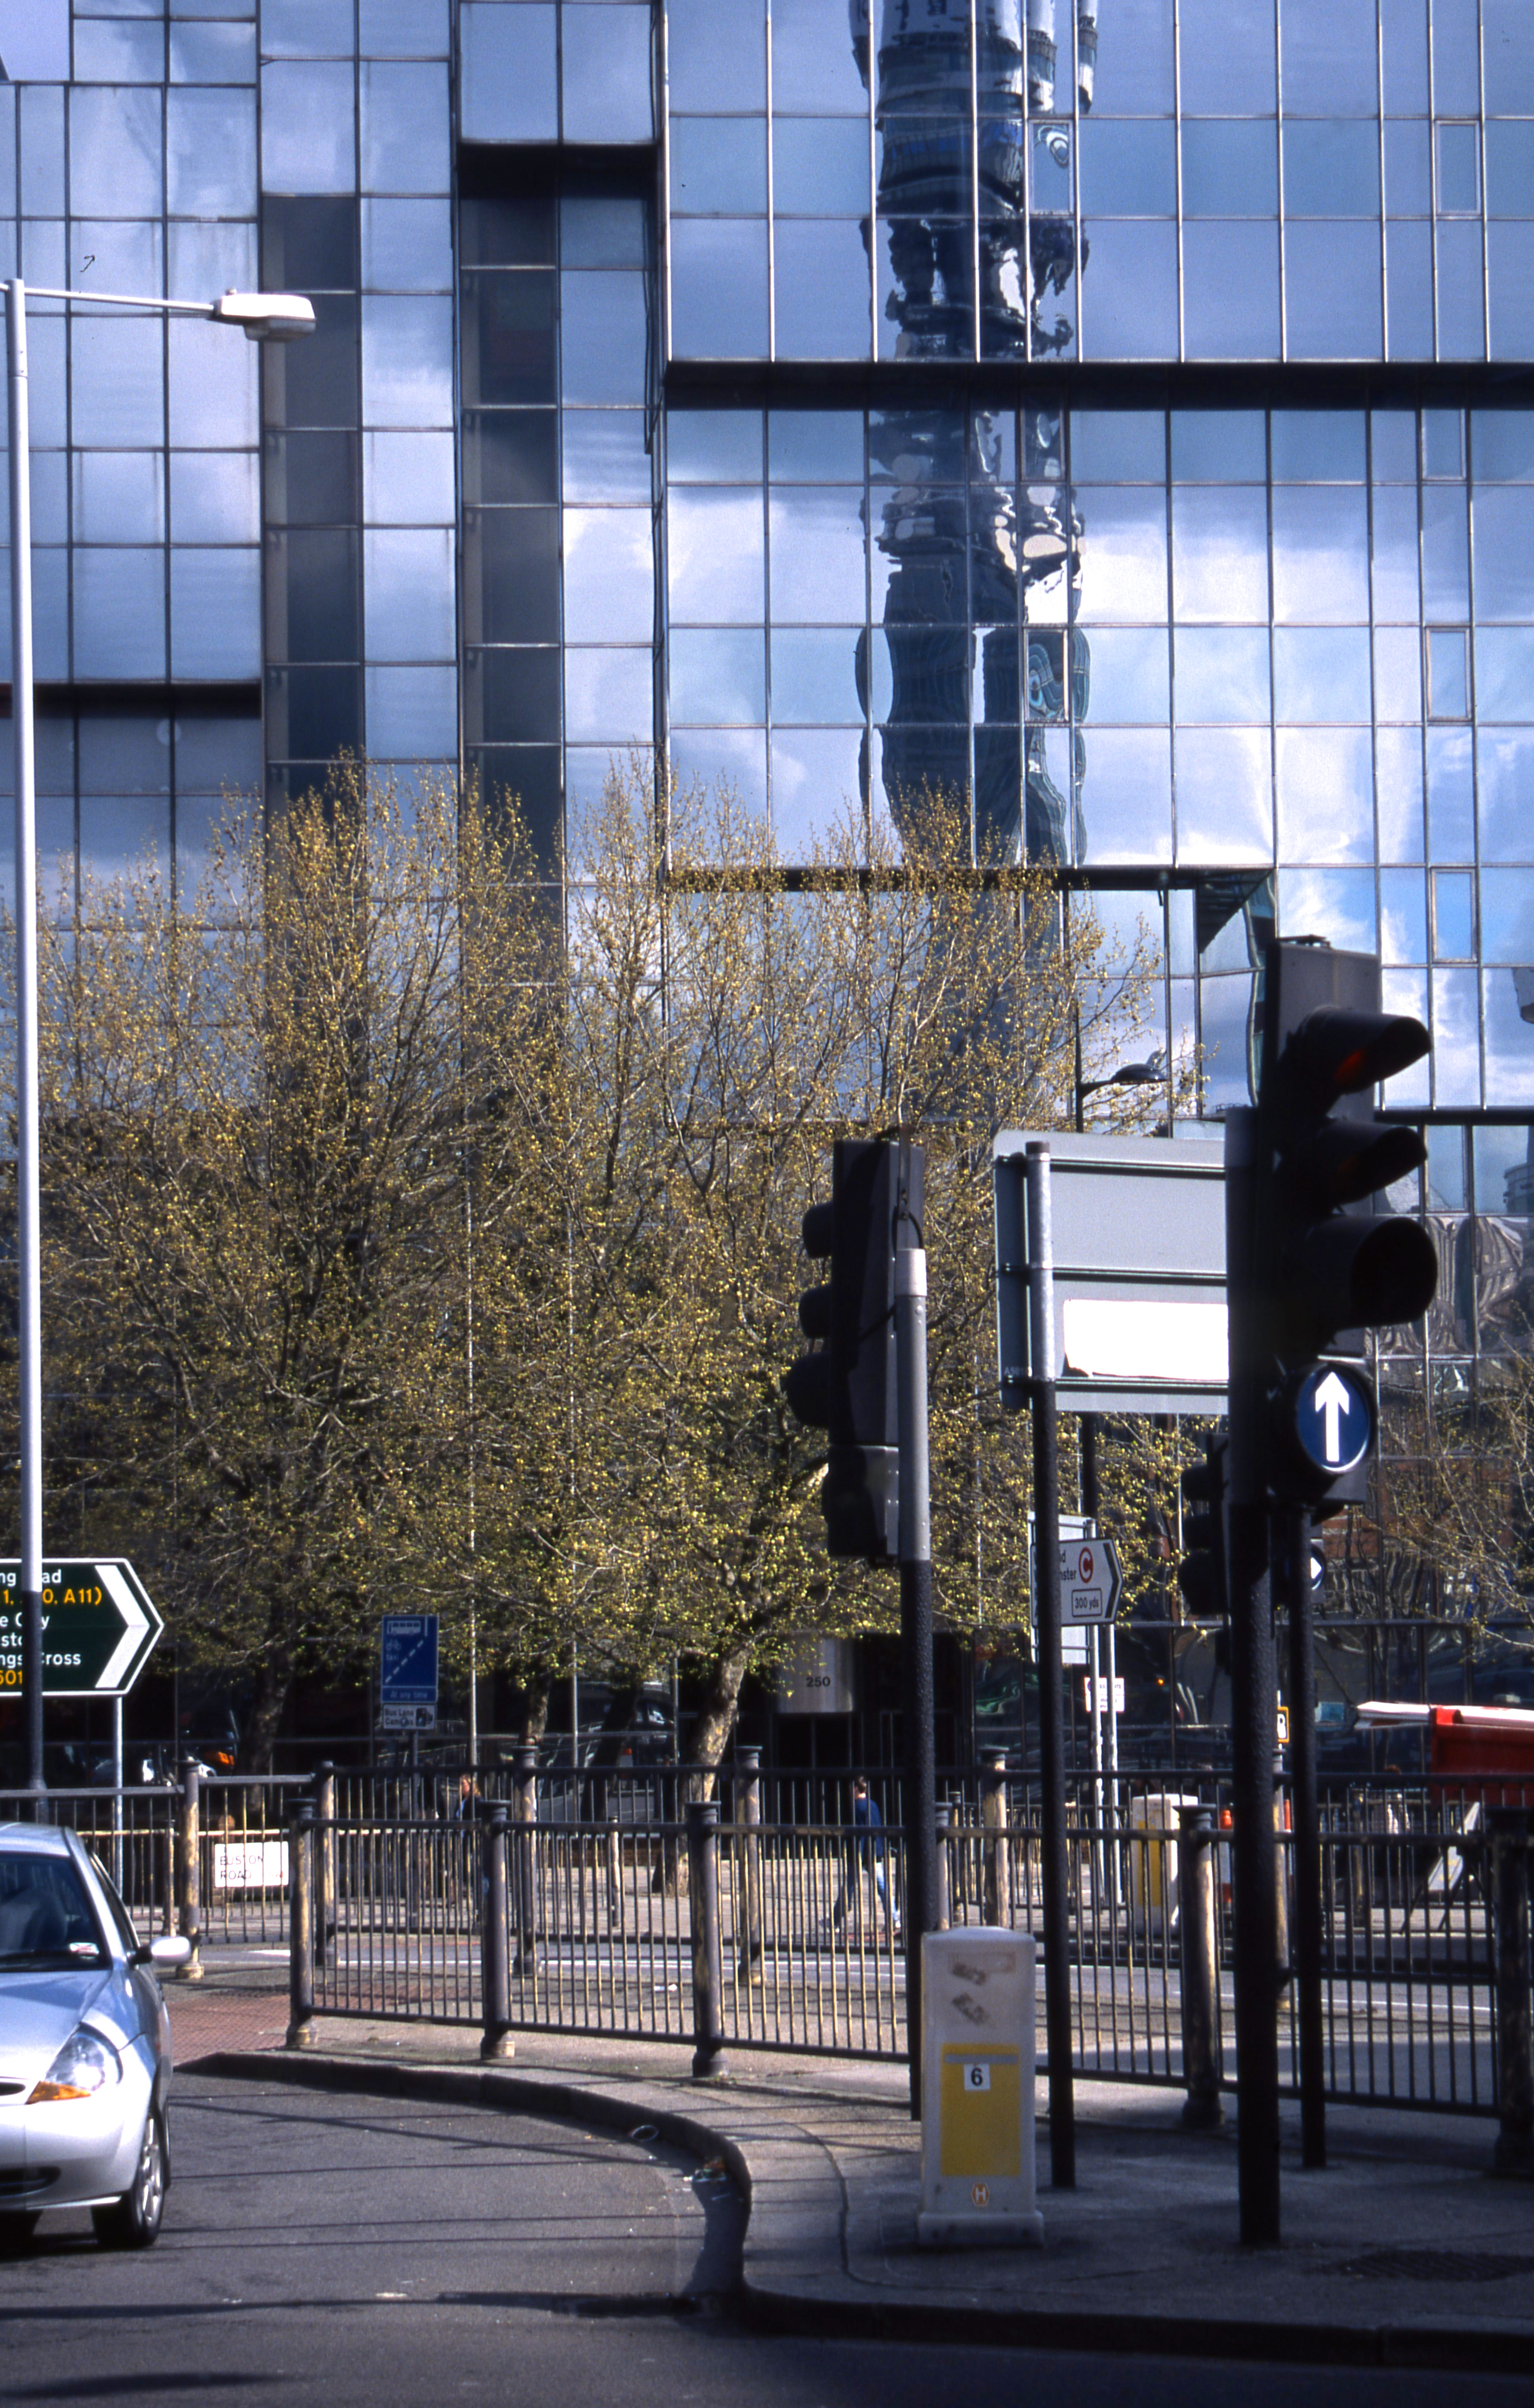 London Reflections Derrickjknight